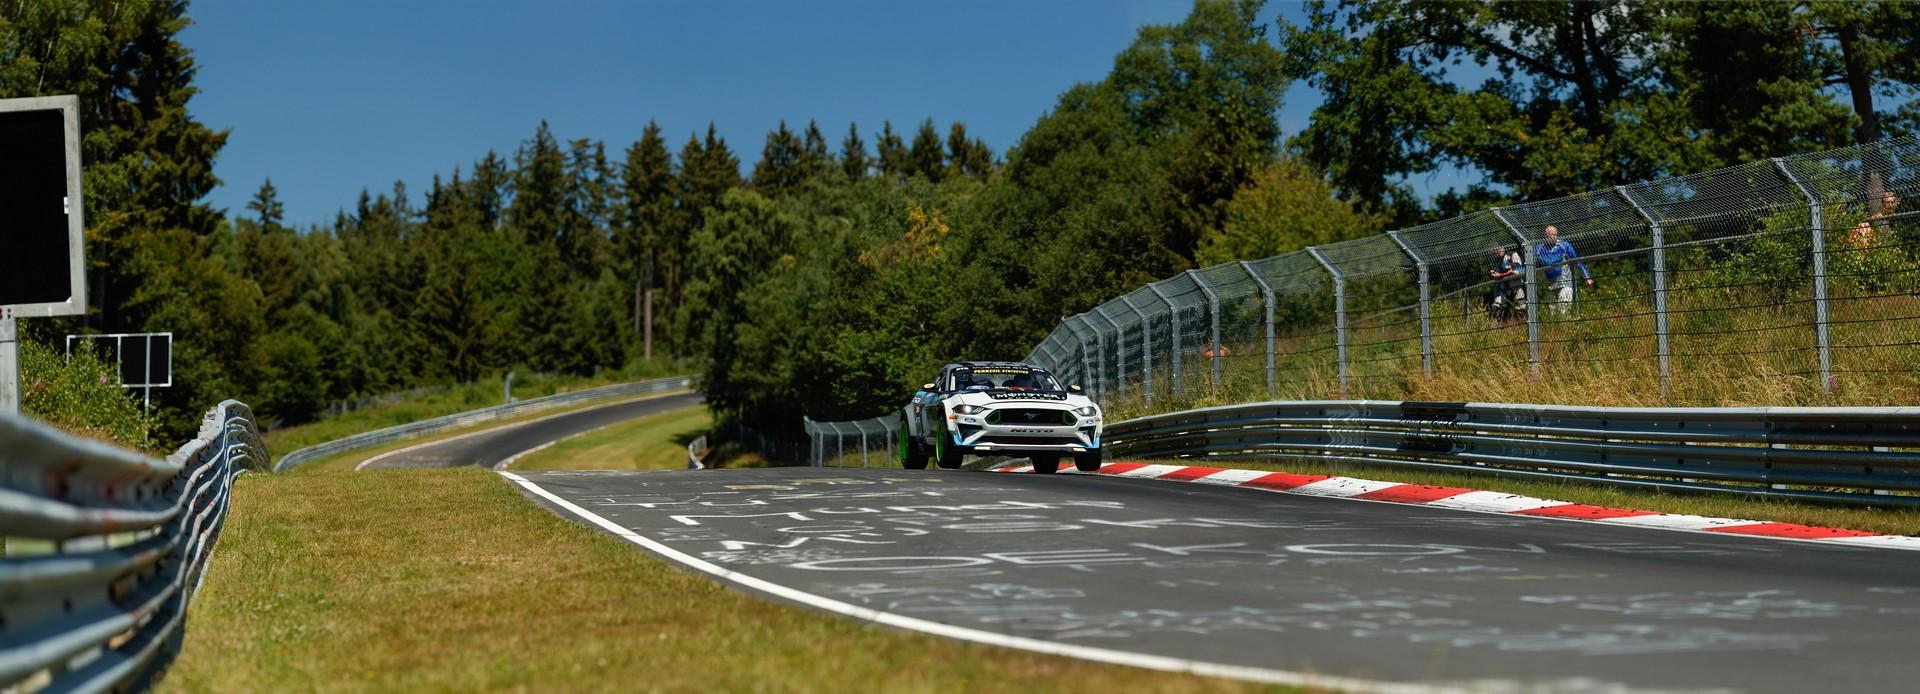 Ford_Mustang_RTR_Nurburgring_0001